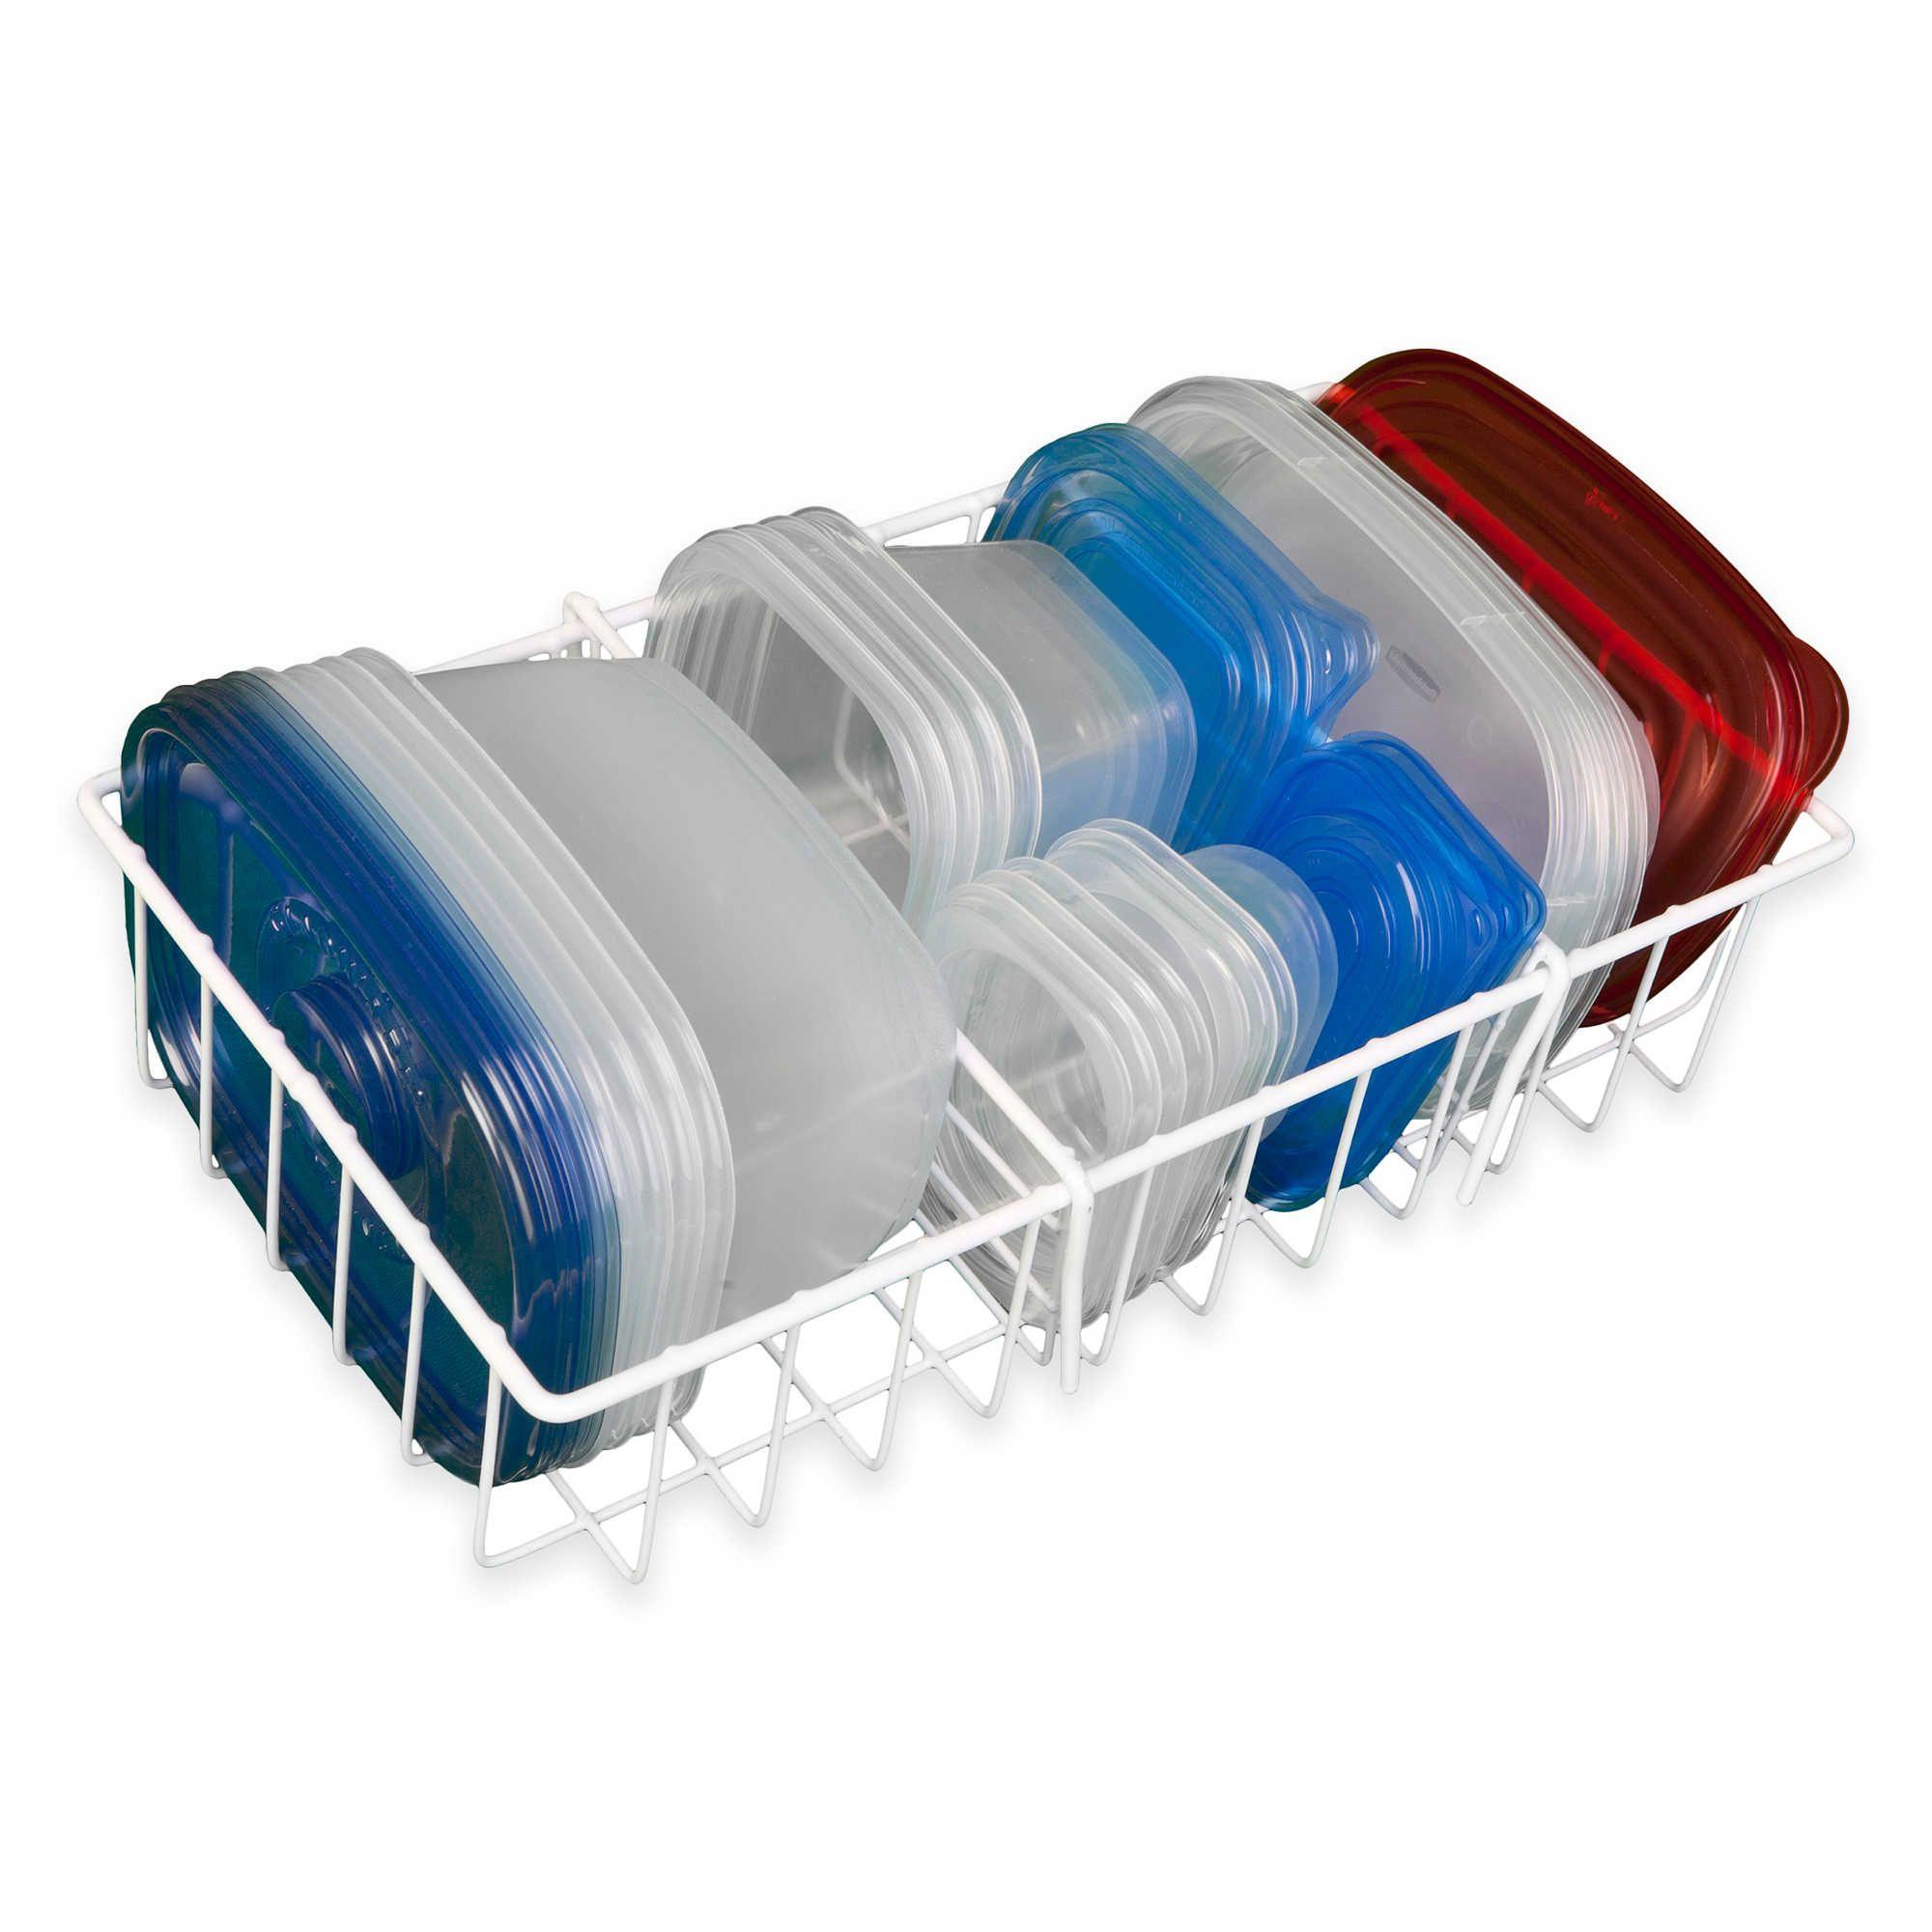 tupperware organizer 15 bed bath and beyond food storage organization kitchen on kitchen organization tupperware id=54358